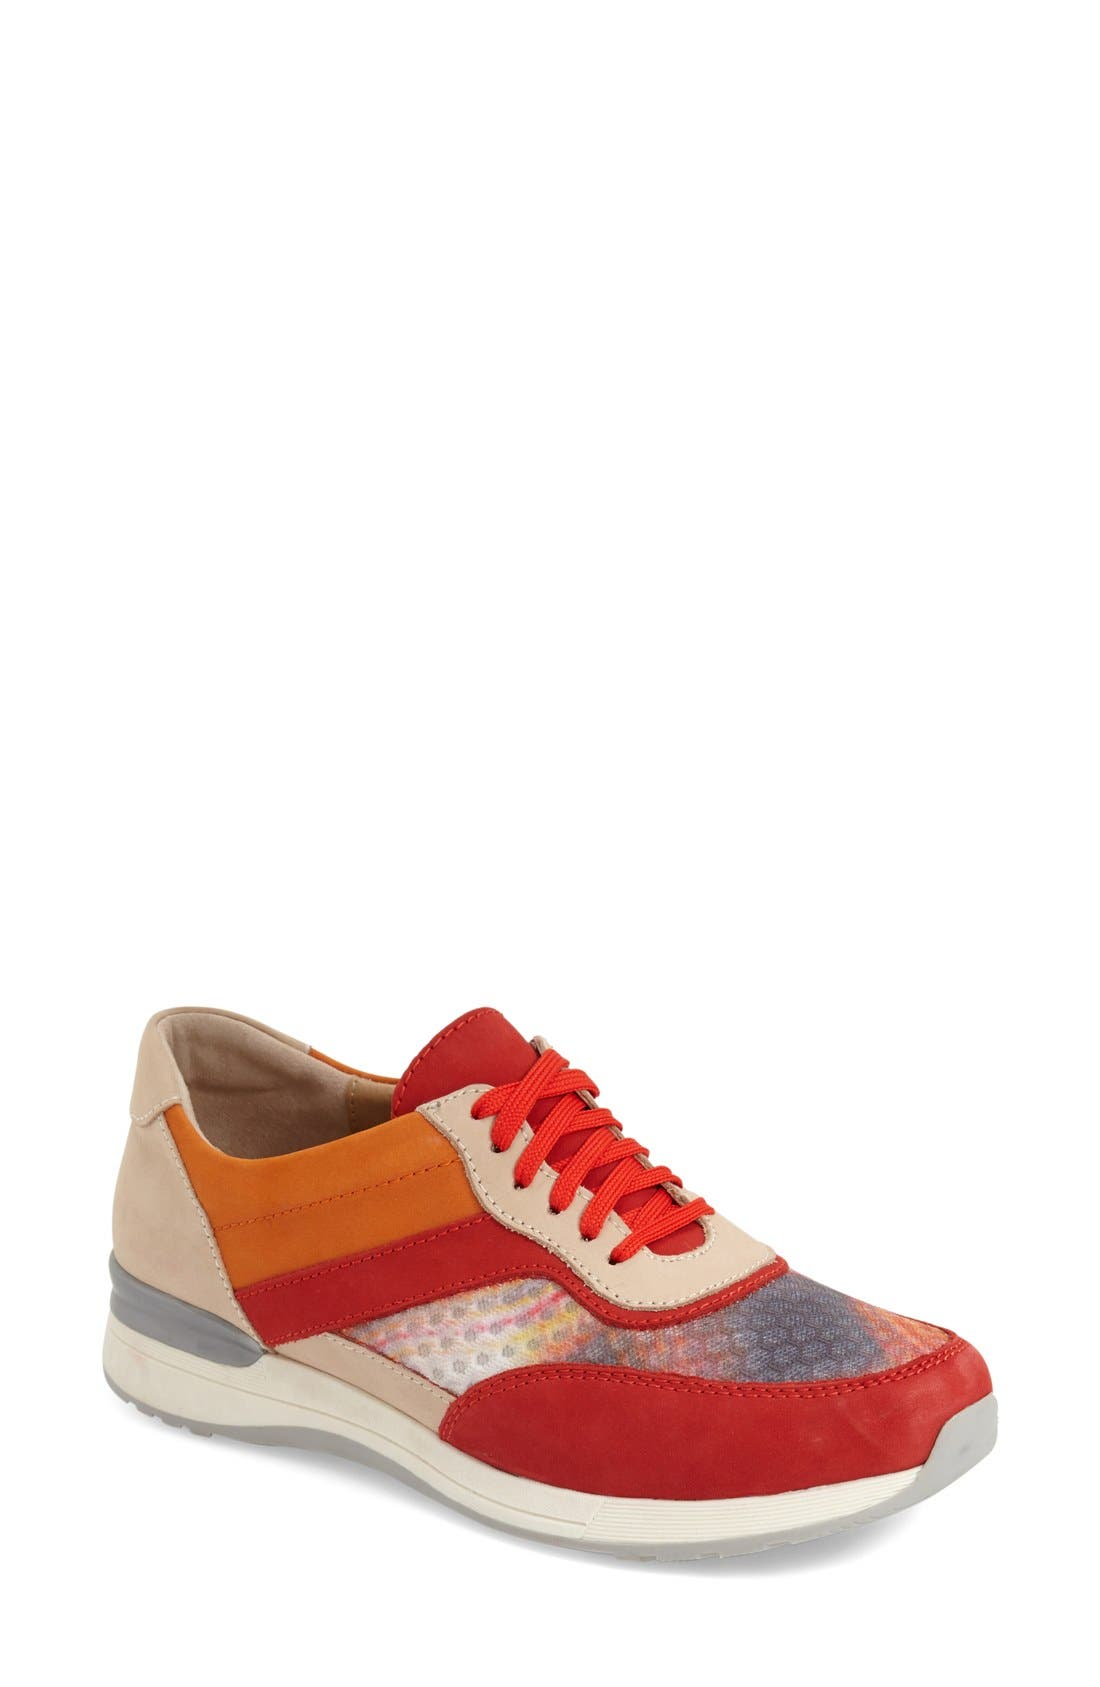 Alternate Image 1 Selected - VANELi 'Pride' Sneaker (Women)